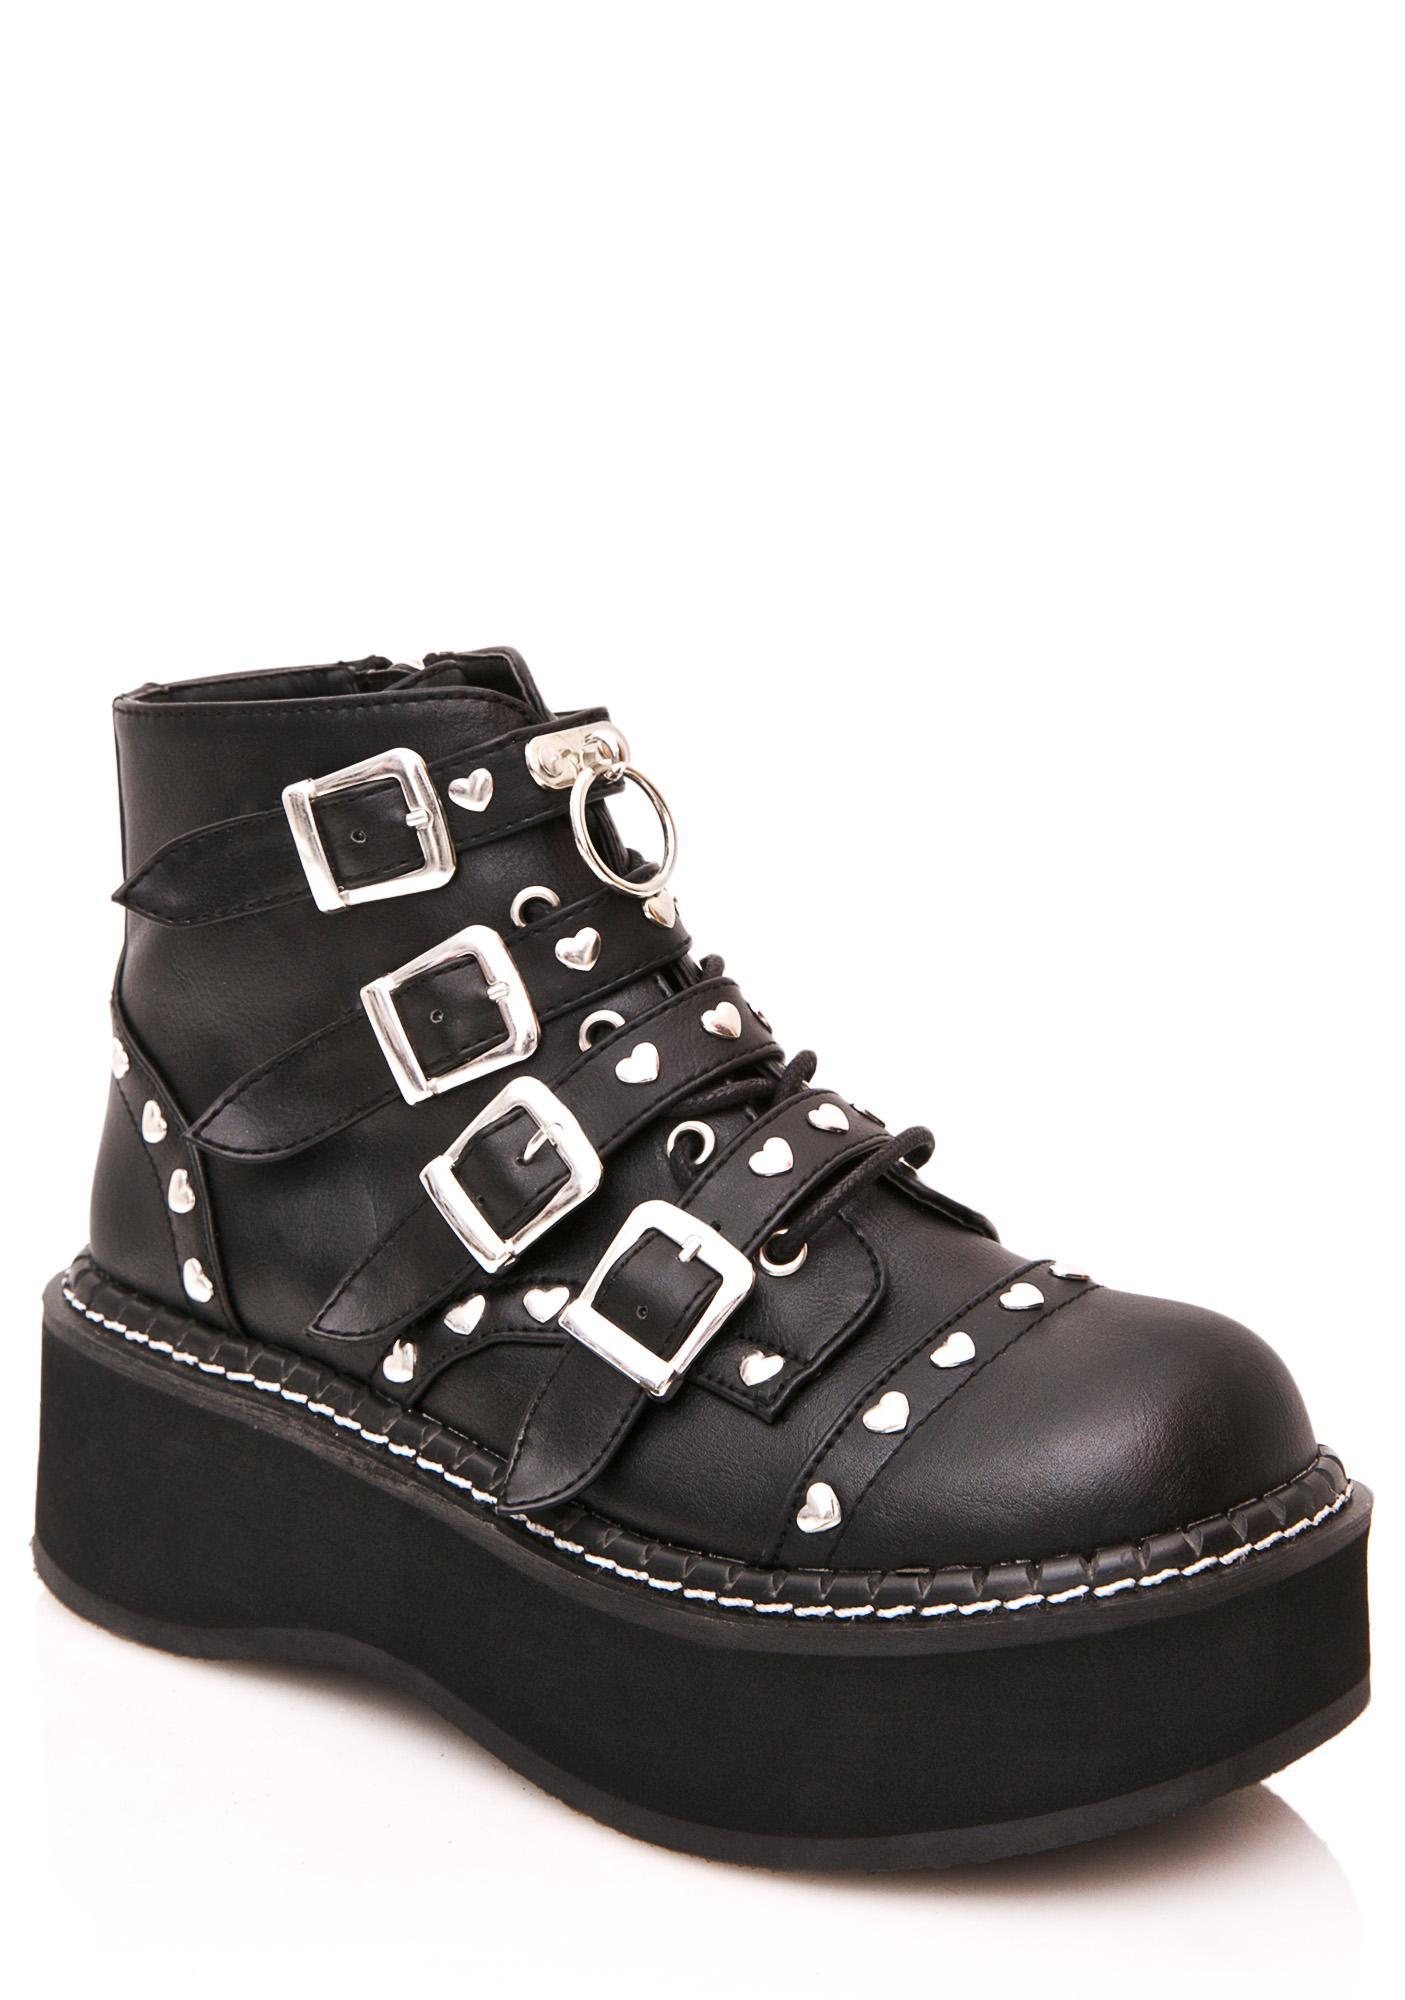 Demonia Emily Buckled Platform Boots